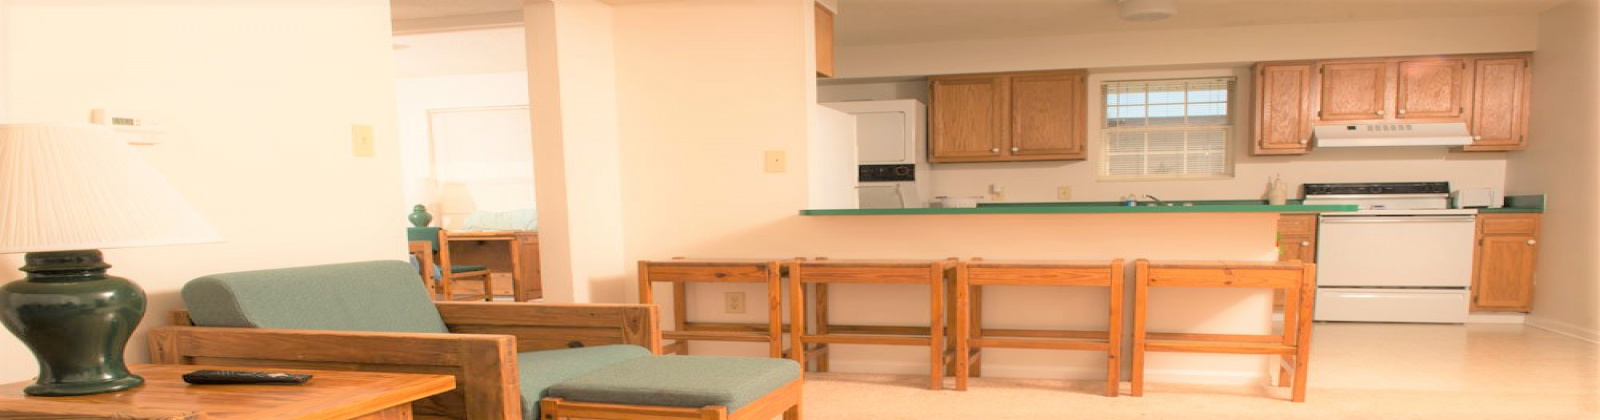 15 S Shafer Street APT 1902 Athens, Ohio, 4 Bedrooms Bedrooms, ,2 BathroomsBathrooms,Apartment,For Rent,Street APT 1902,1104